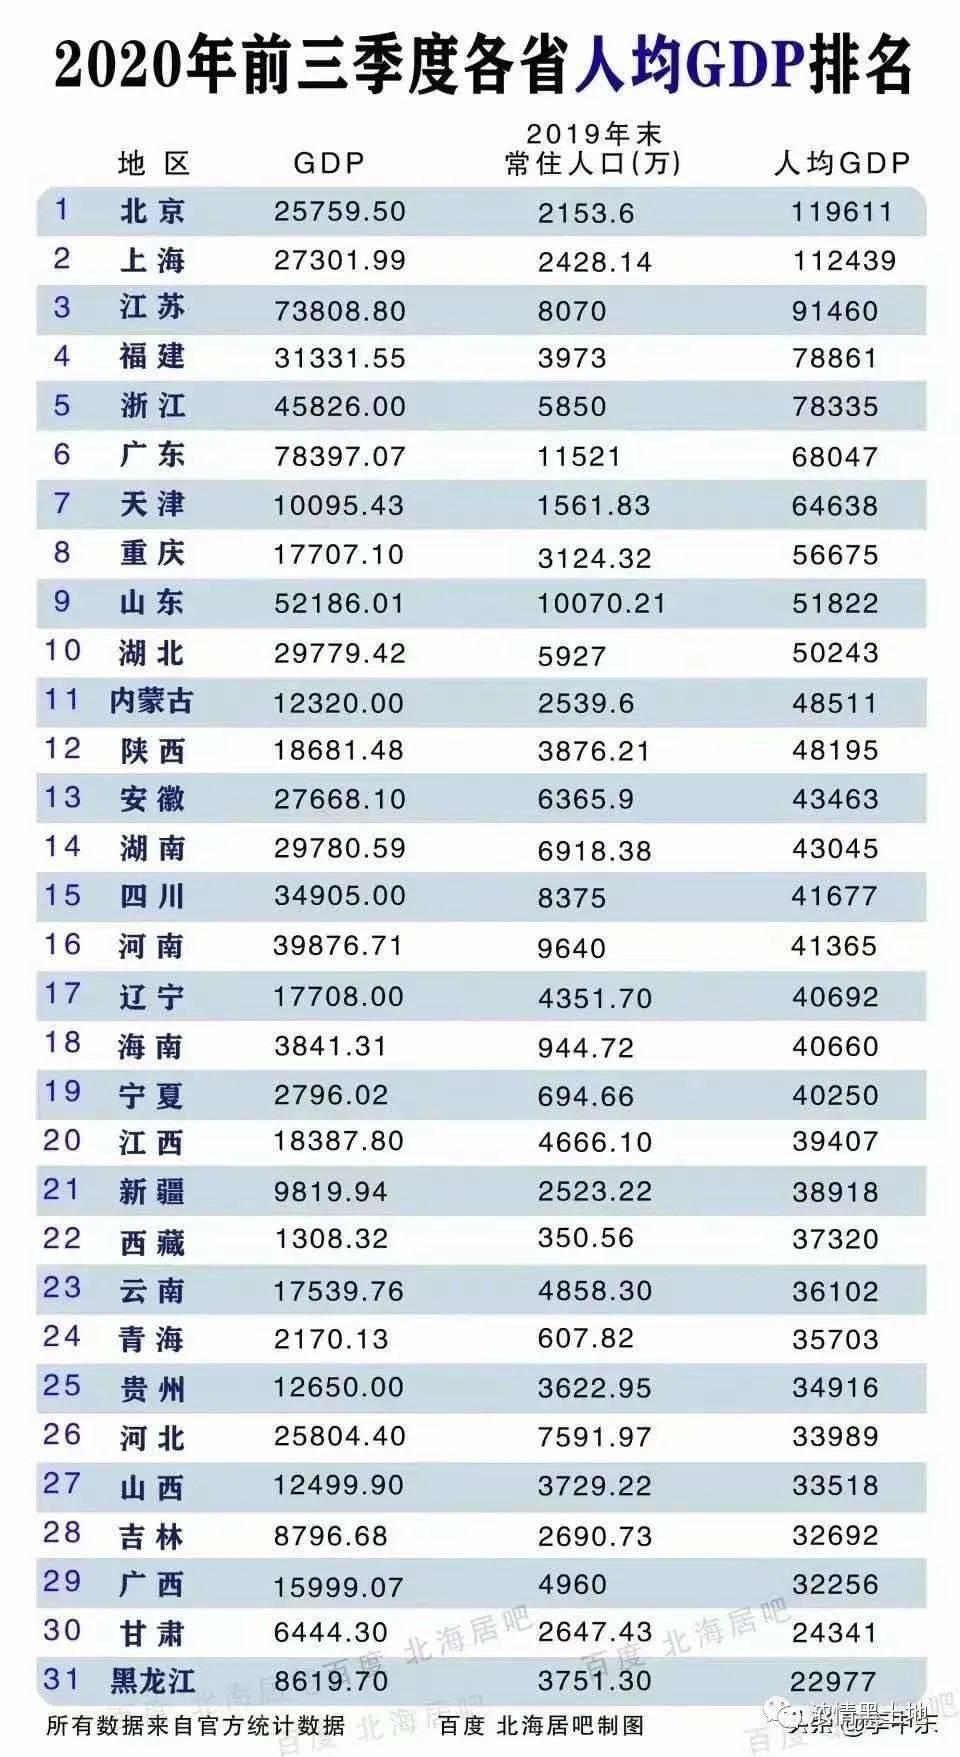 2020 武汉 人均gdp_武汉gdp